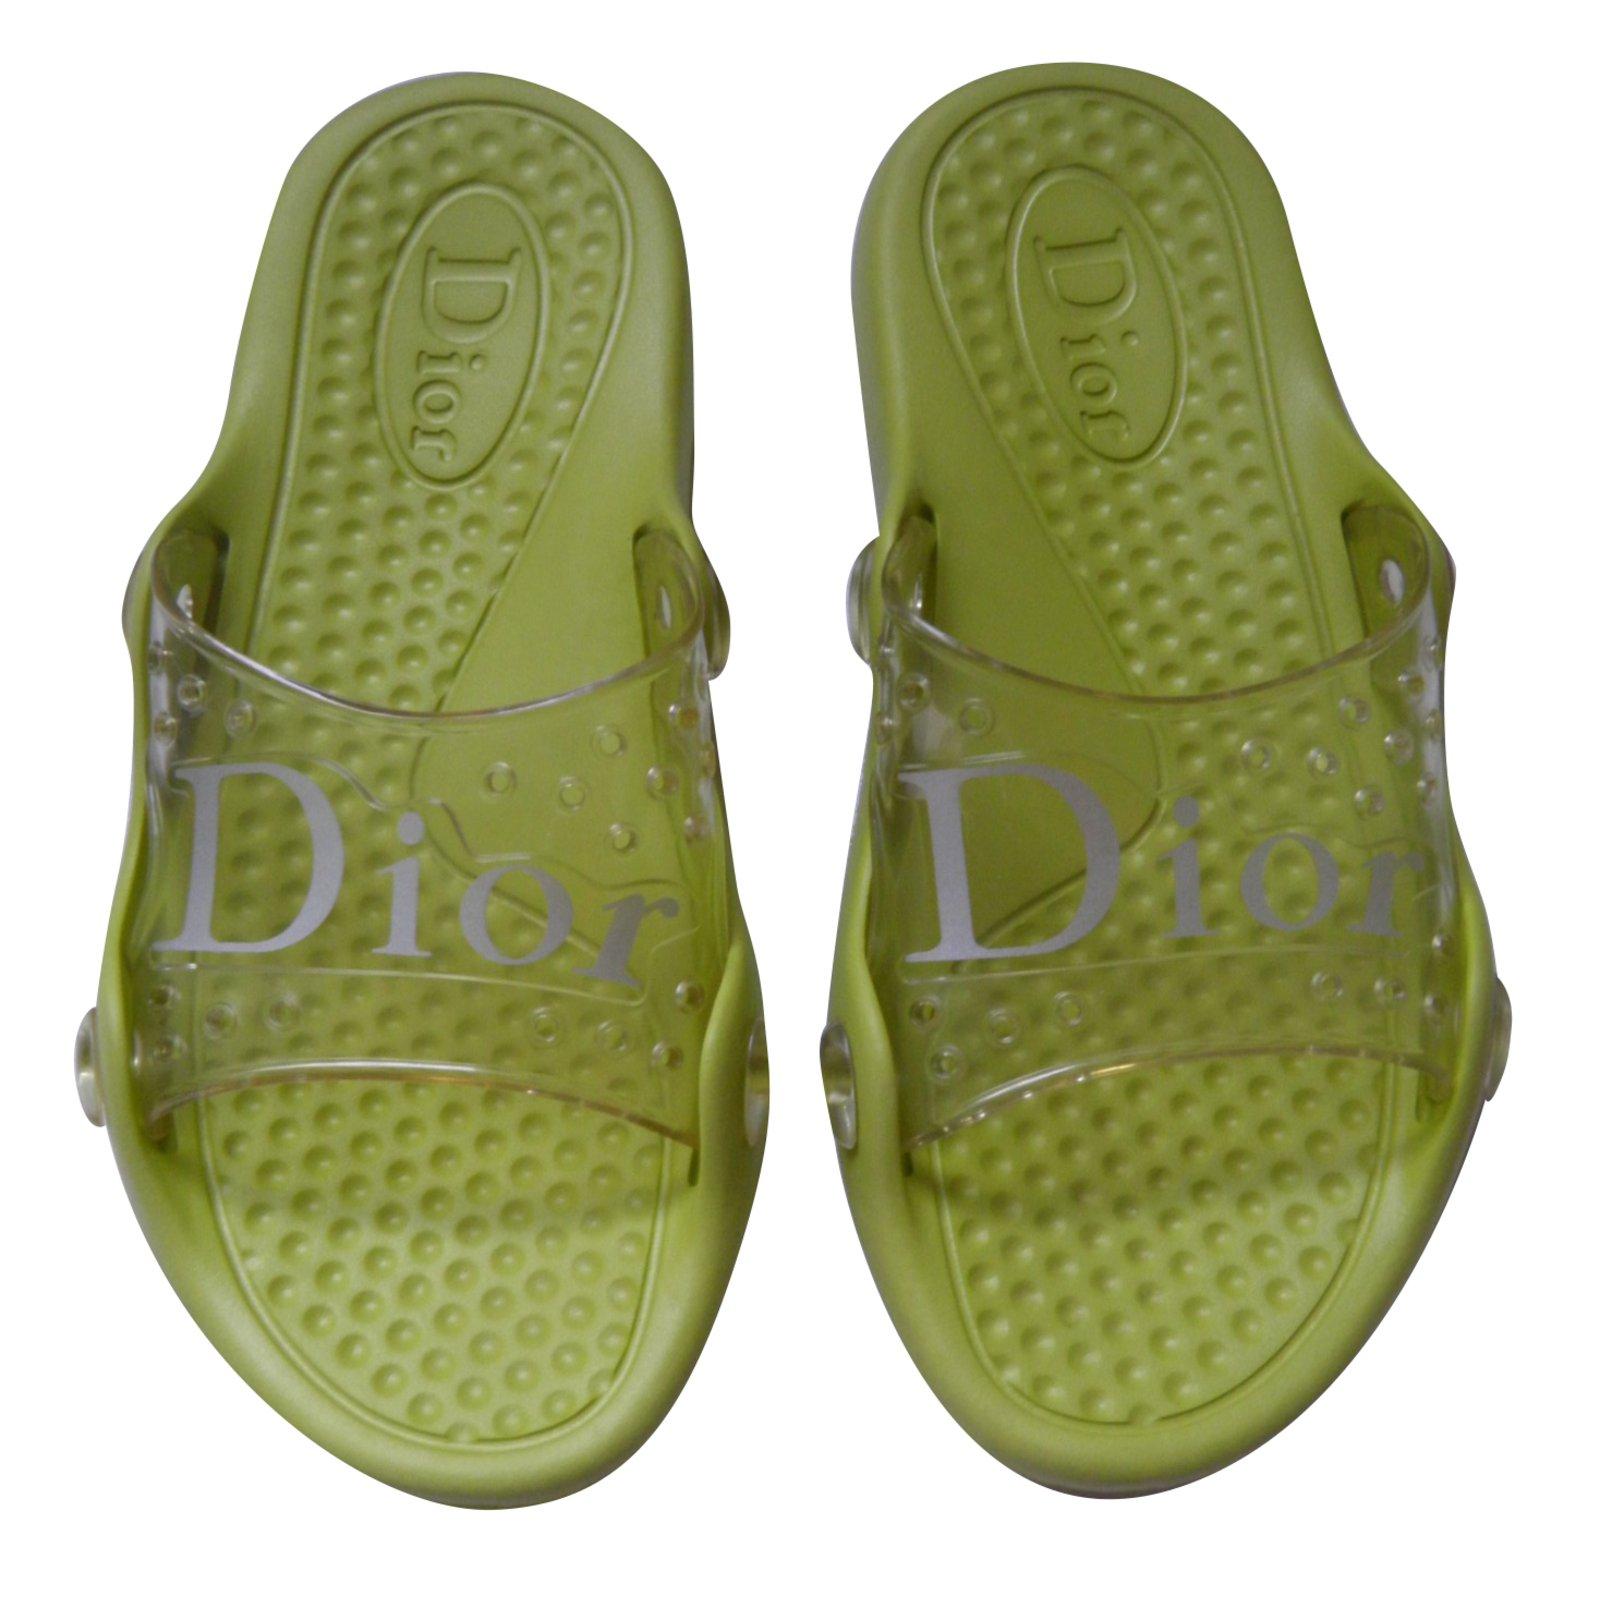 3186207630c7 Dior sandals rubber yellow ref joli closet jpg 1600x1600 Yellow rubber  sandals